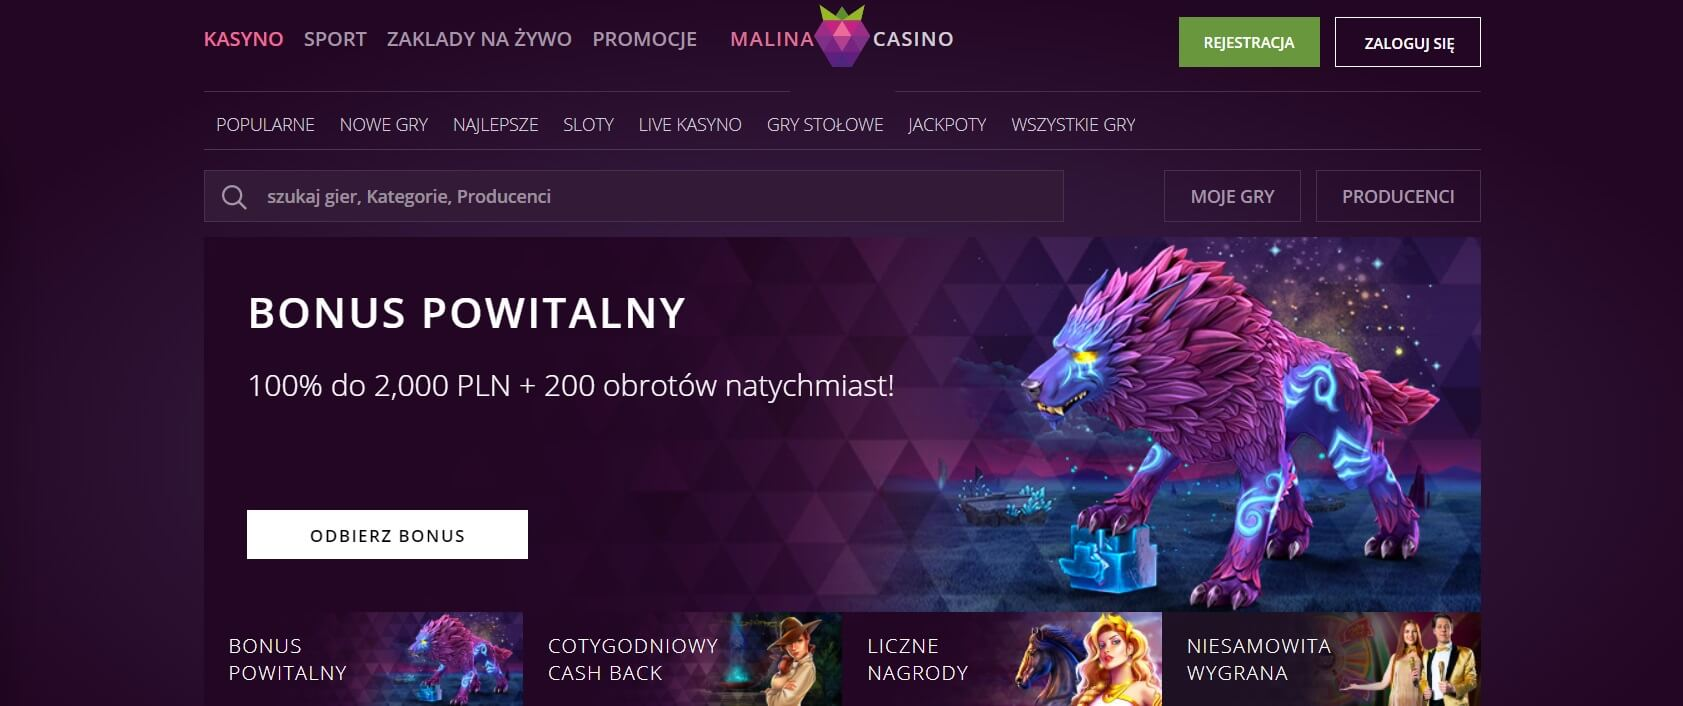 malina casino bonus powitalny screenshot